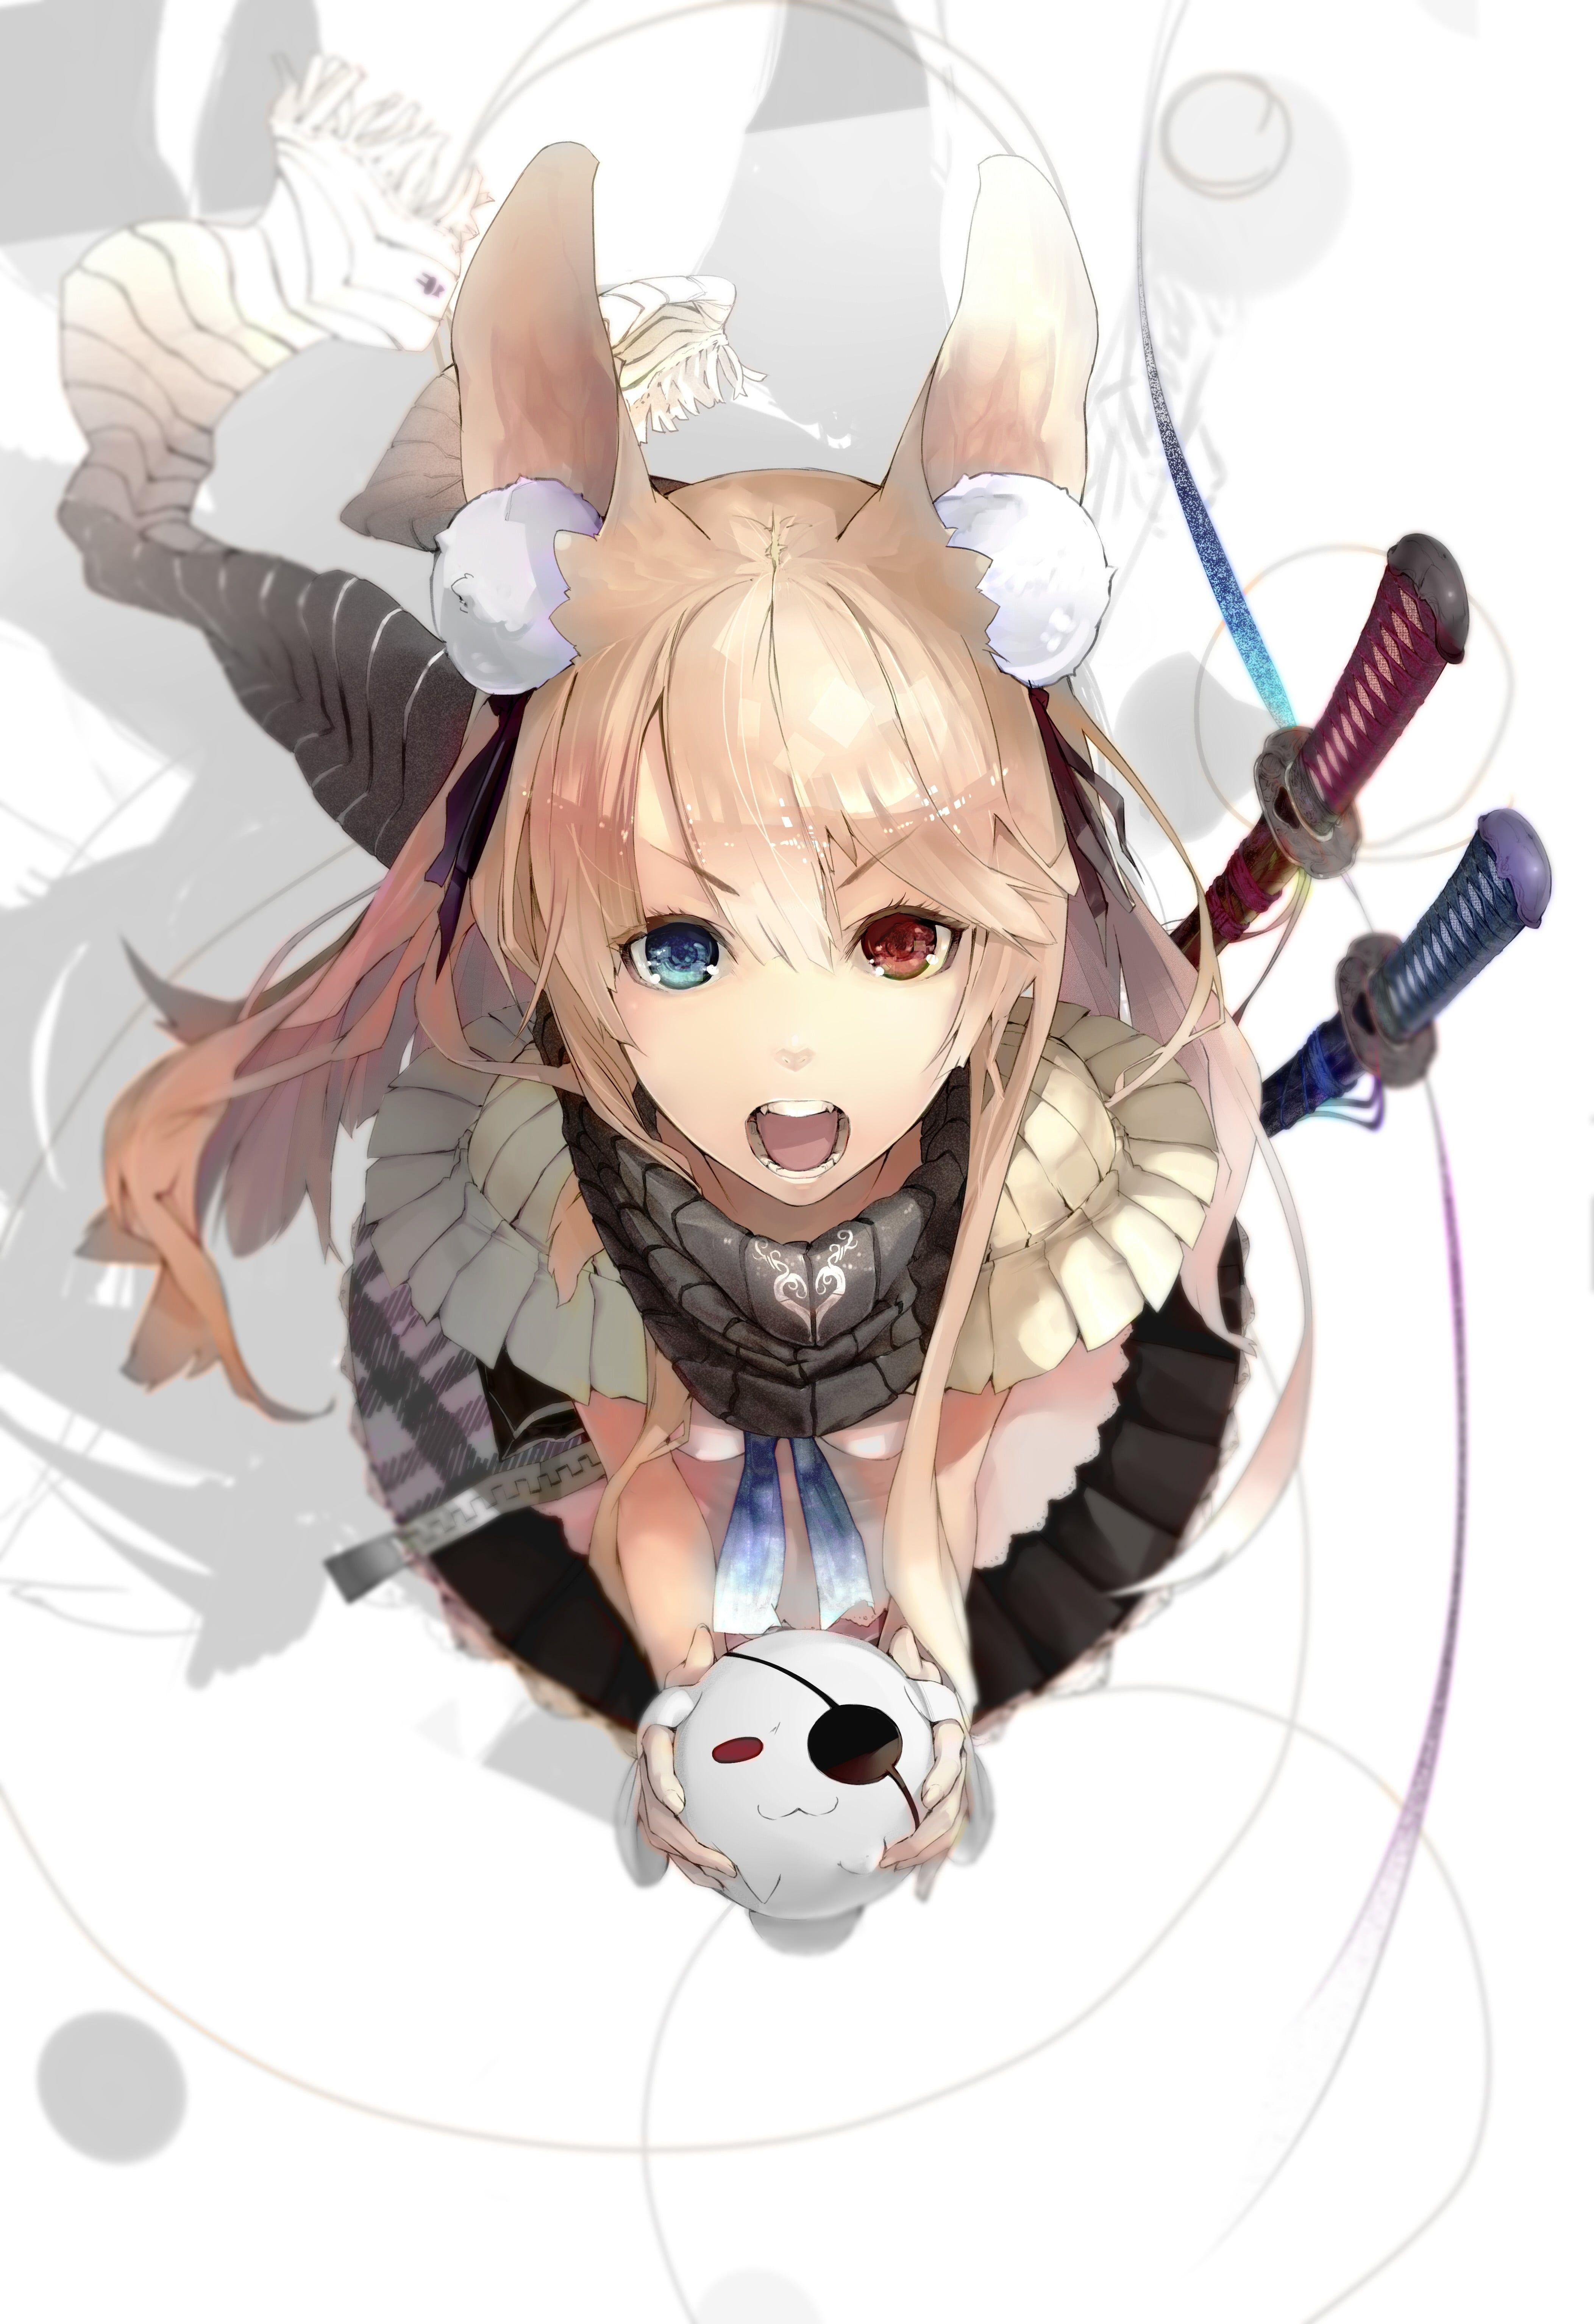 heterochromiceyed girl anime character original